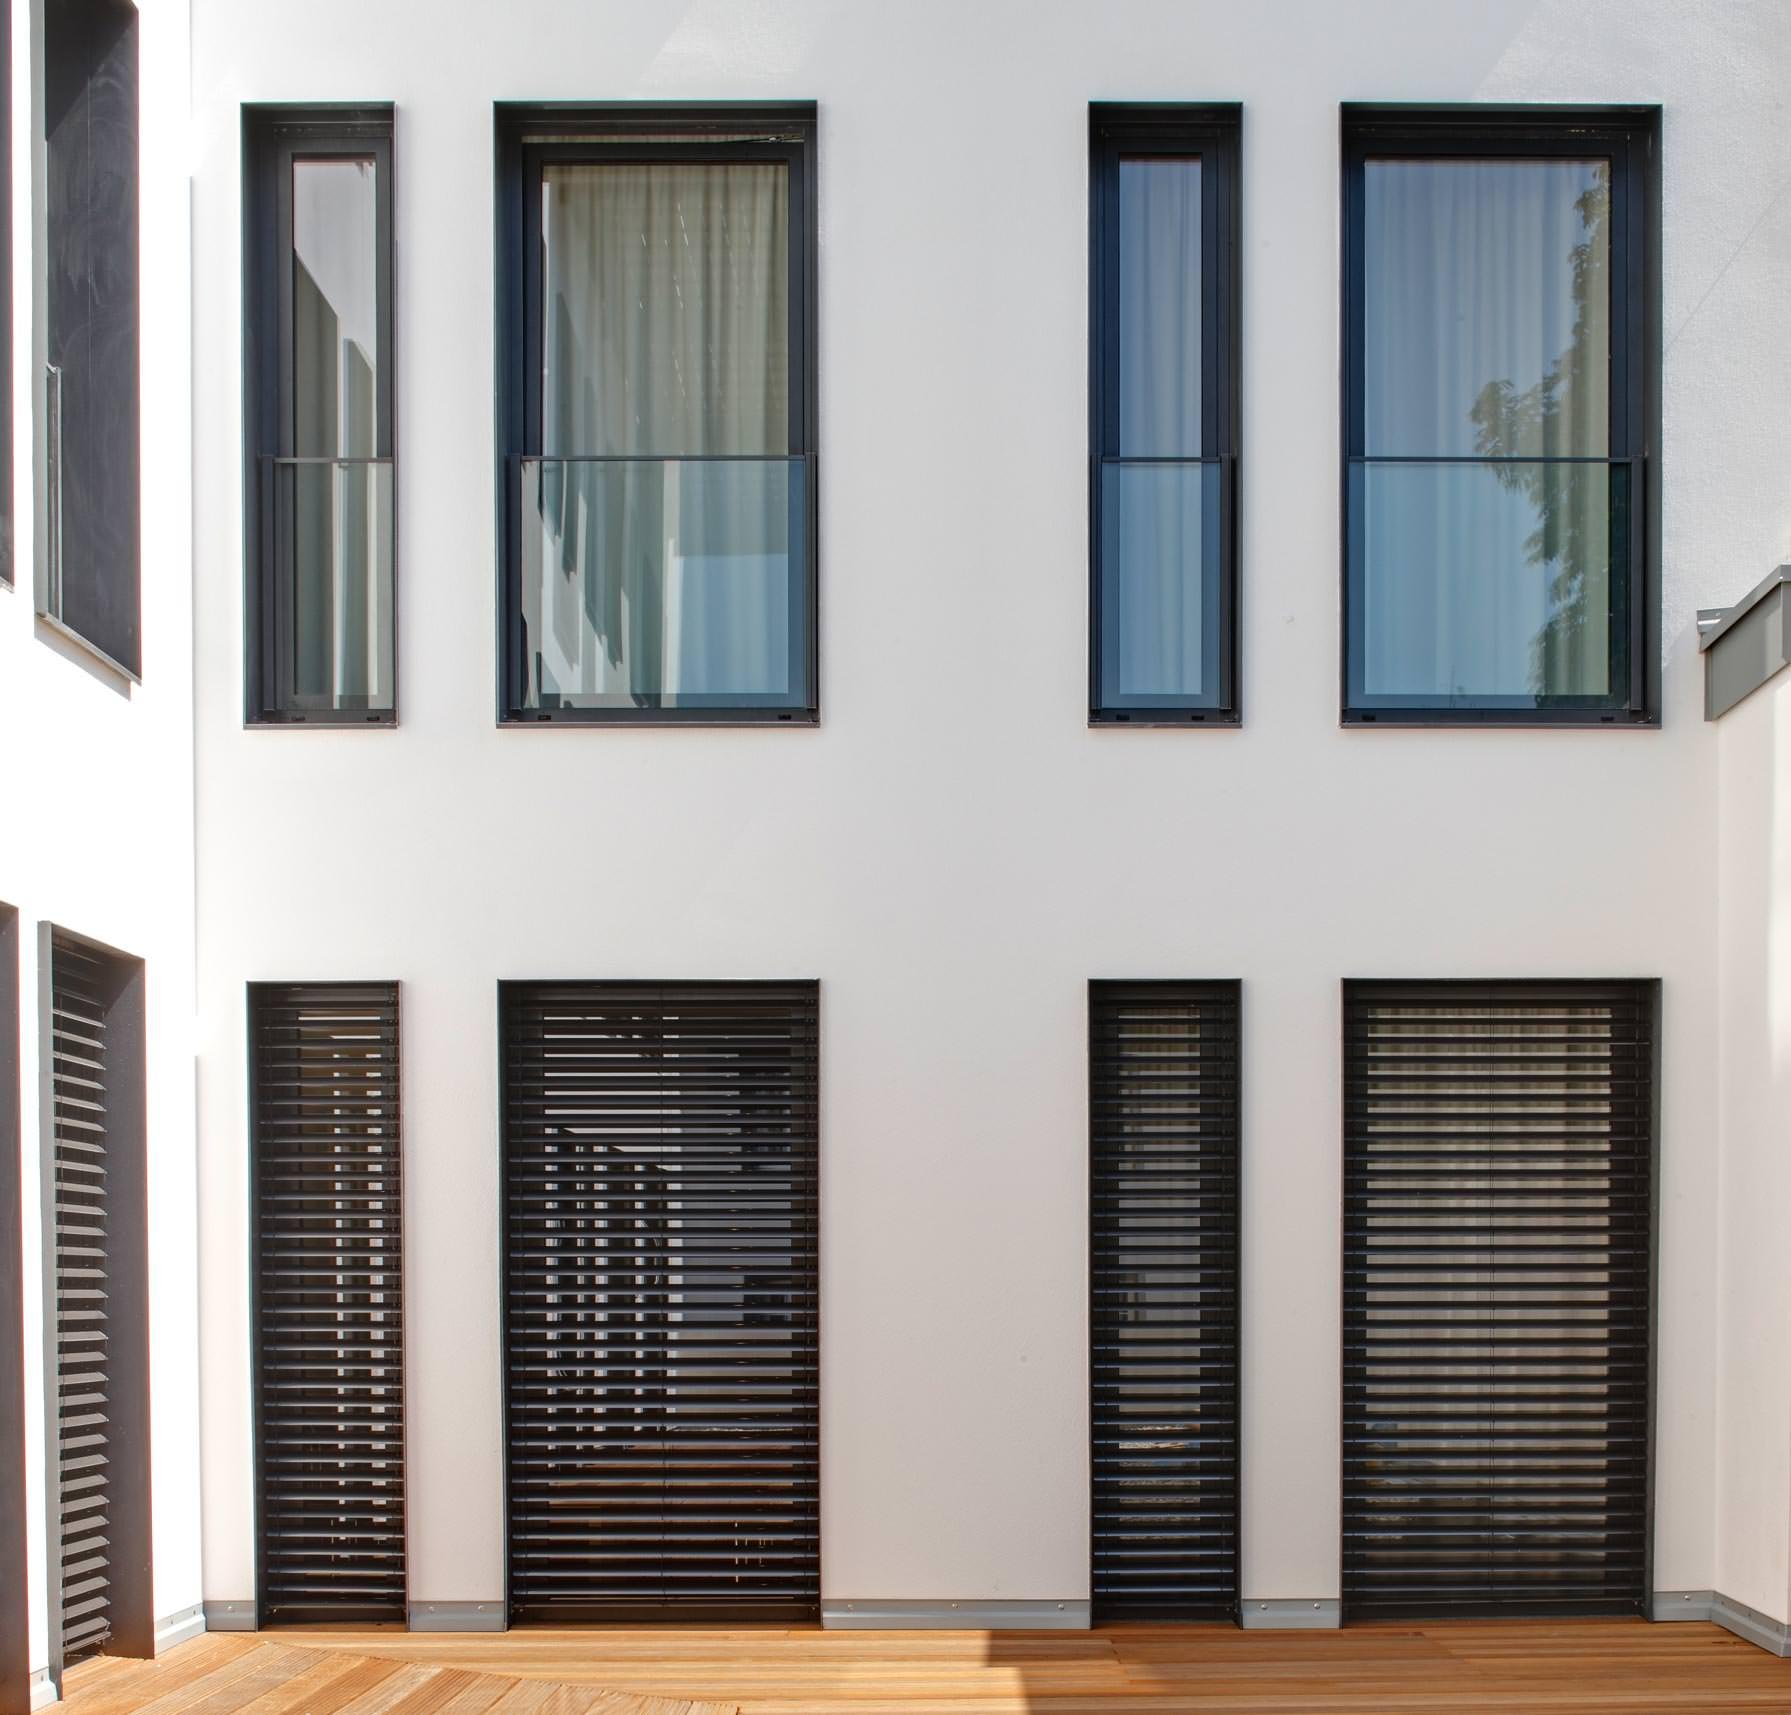 sch co erweitert sein automotivefinish farbkonzept f r kunststoffprofile. Black Bedroom Furniture Sets. Home Design Ideas